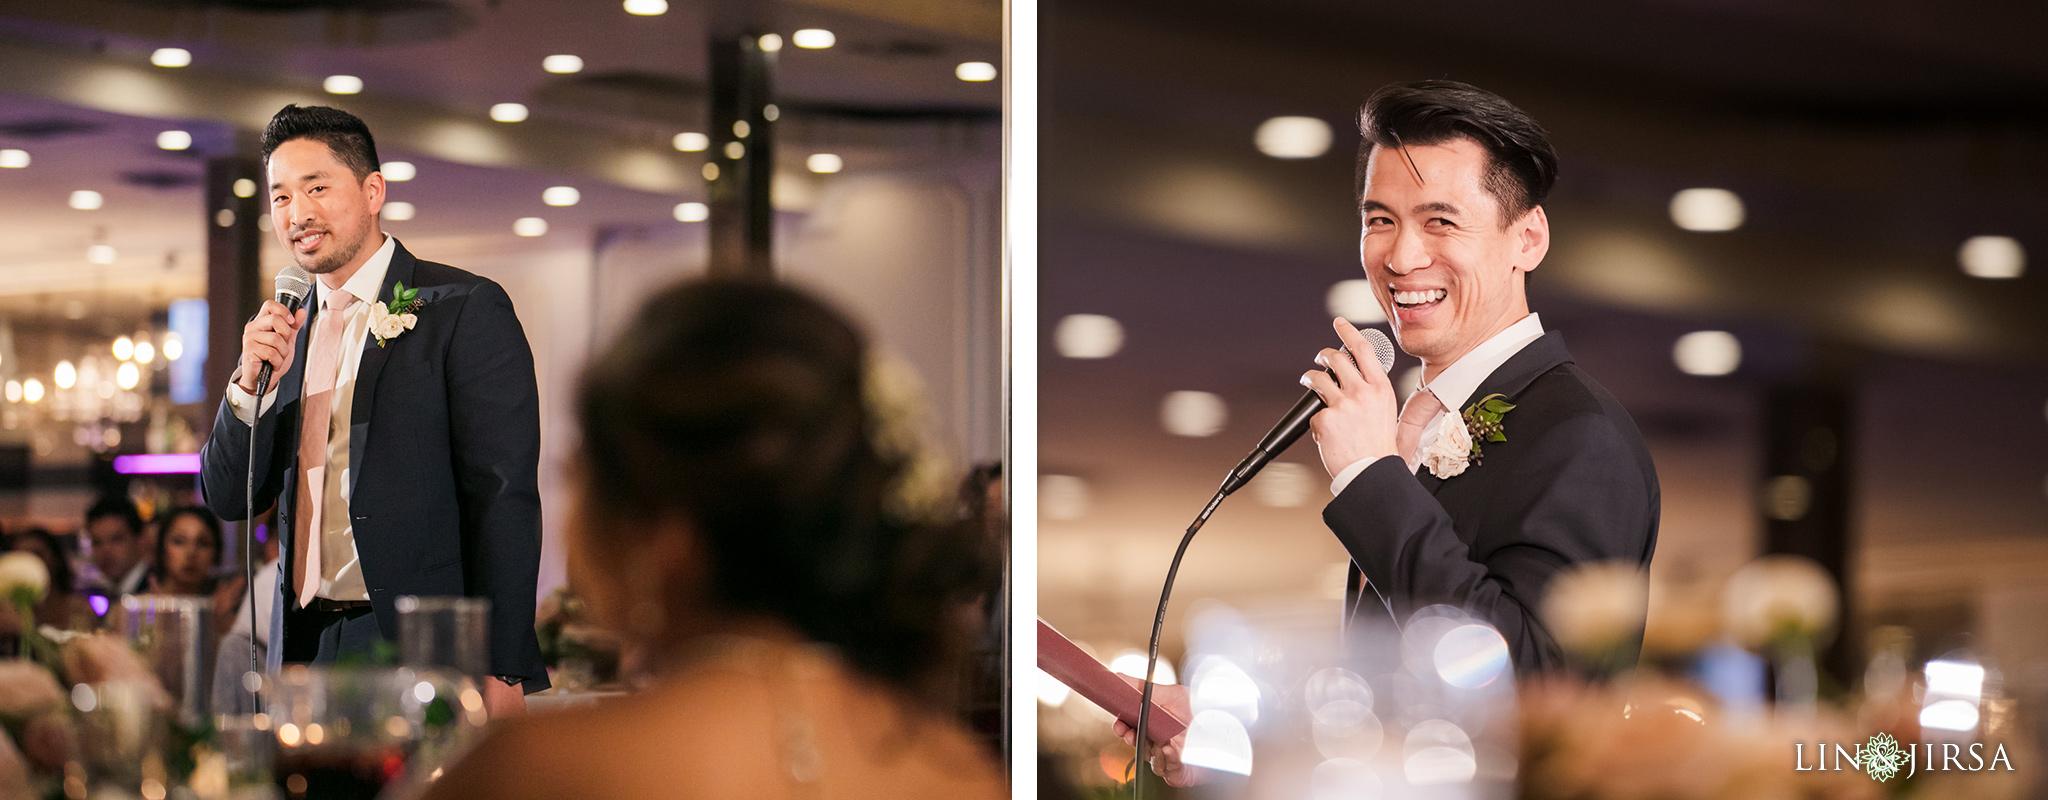 34 grandview ballroom glendale wedding photography